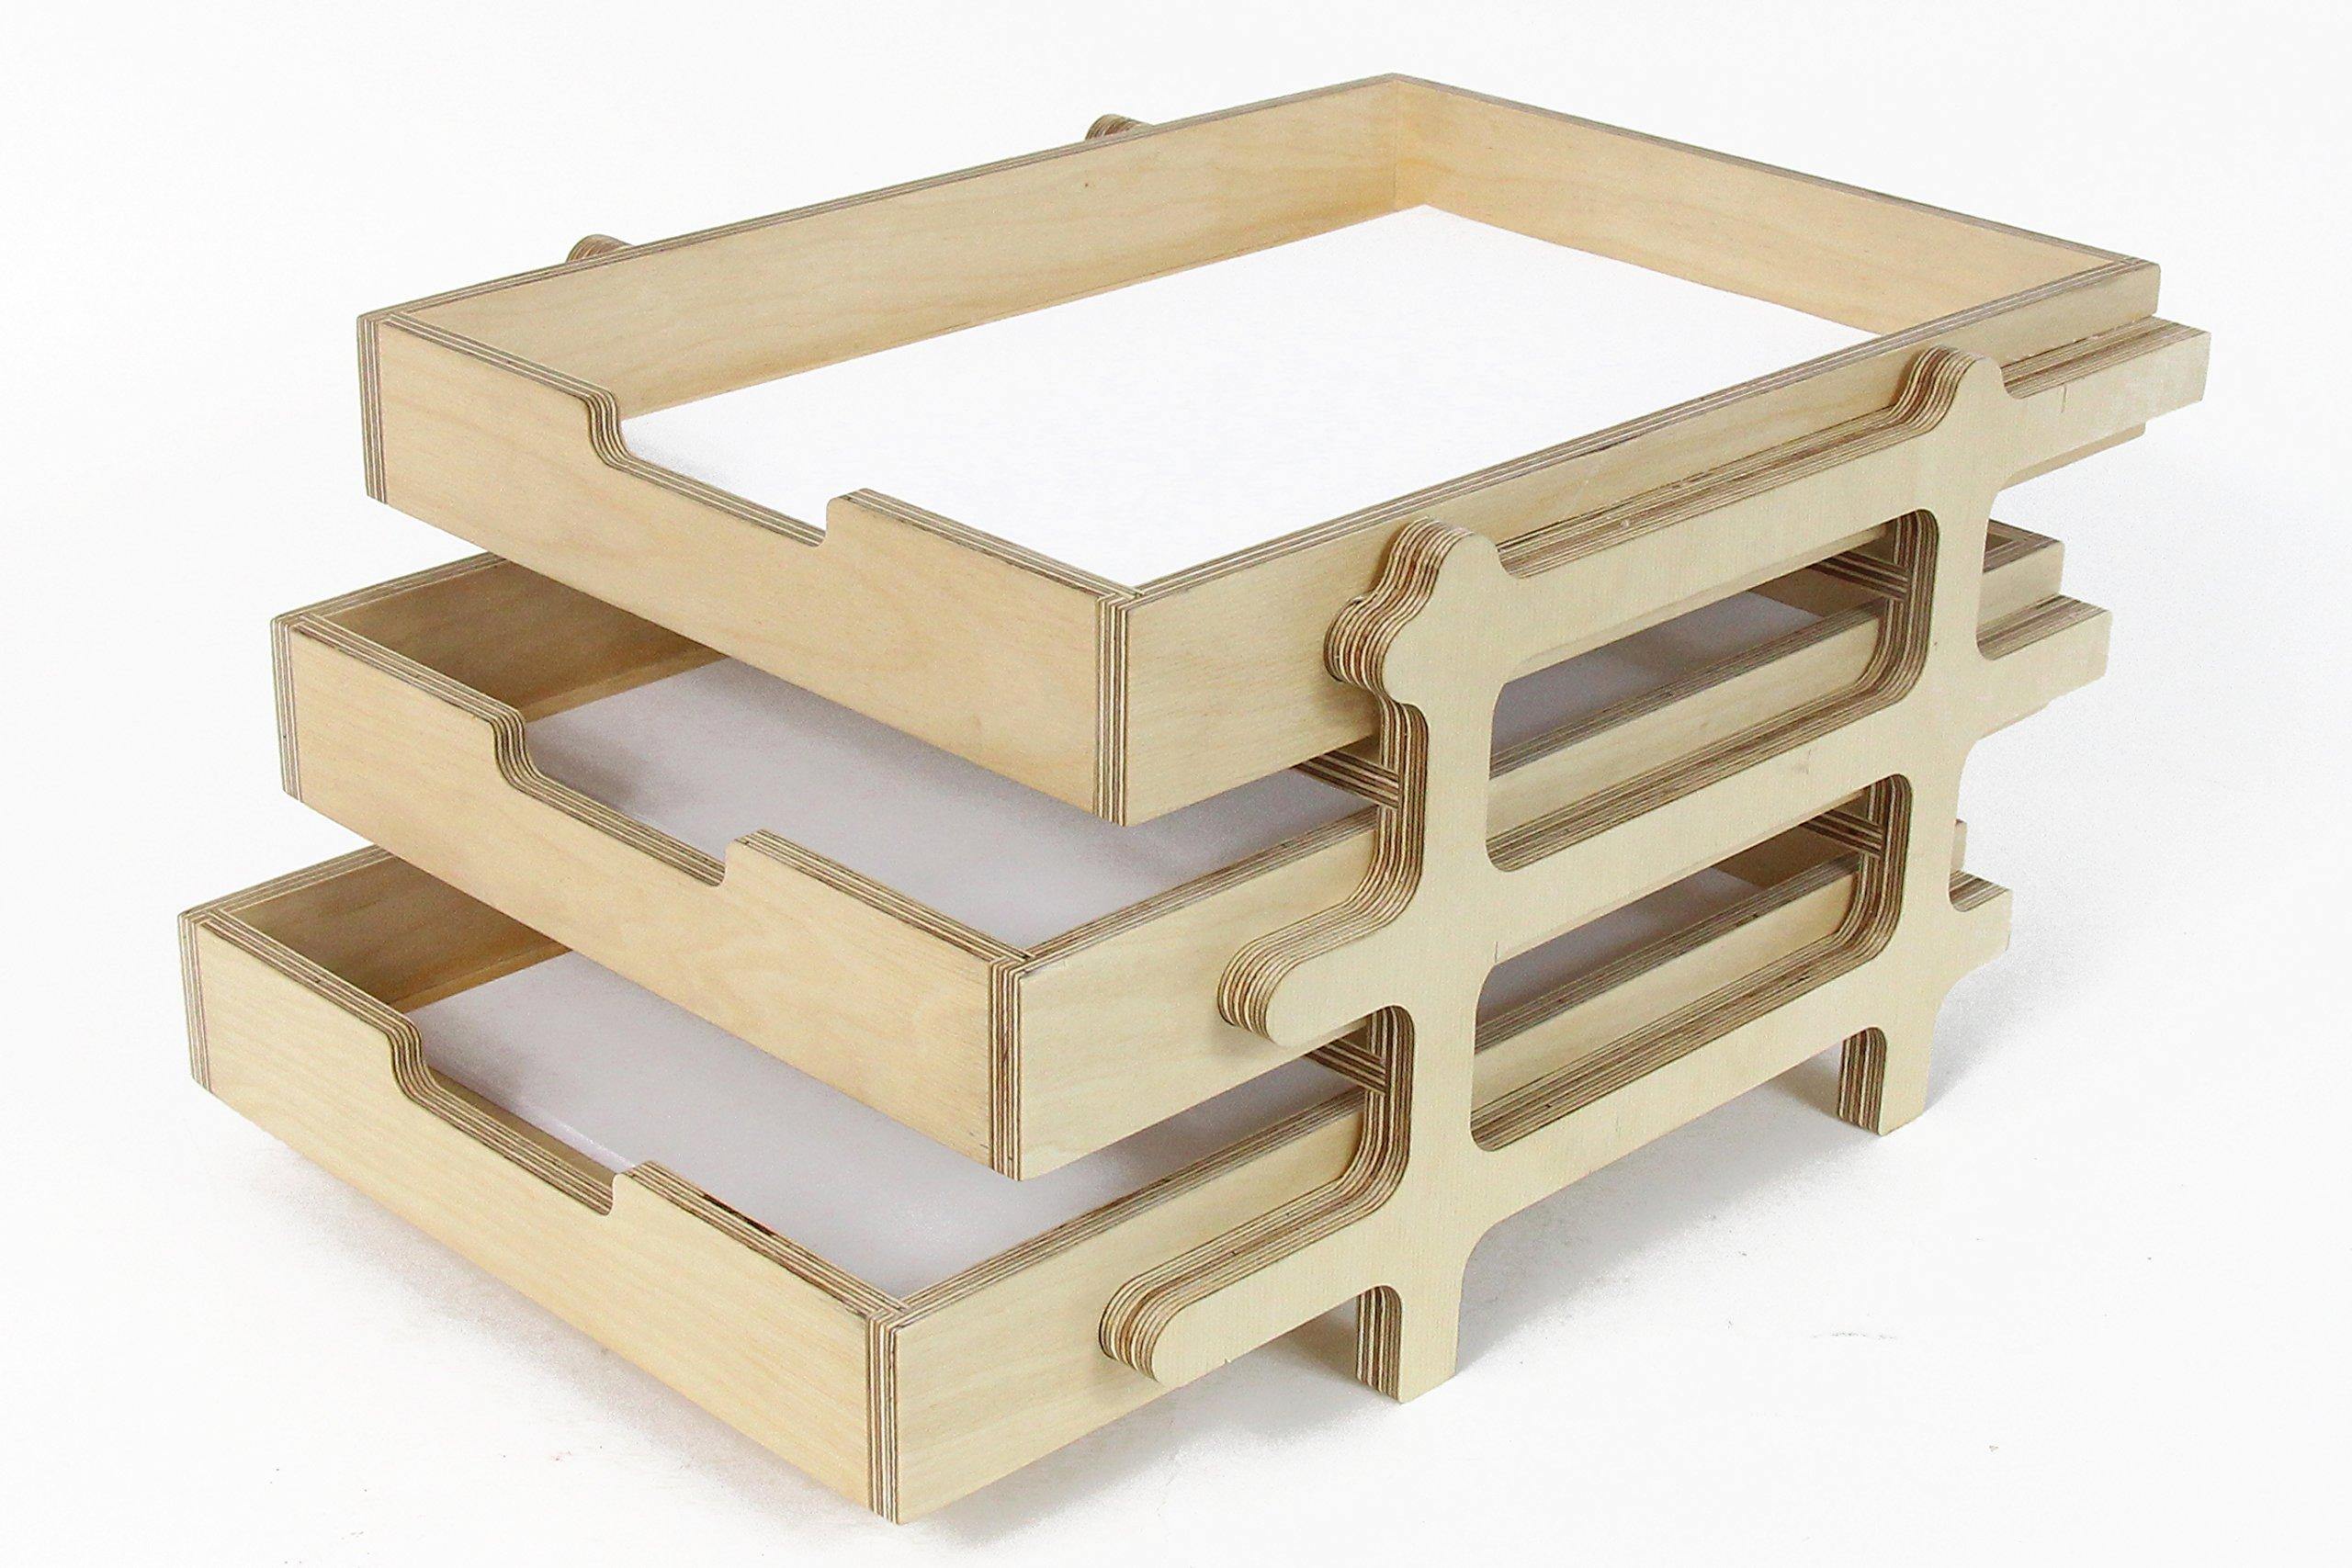 Desk Organizer, Desk Tray, Paper Tray, Wood Desk Tray, Wood Tray, Office Desk Accessories, Desk Accessories, Small Desk, Industrial Desk